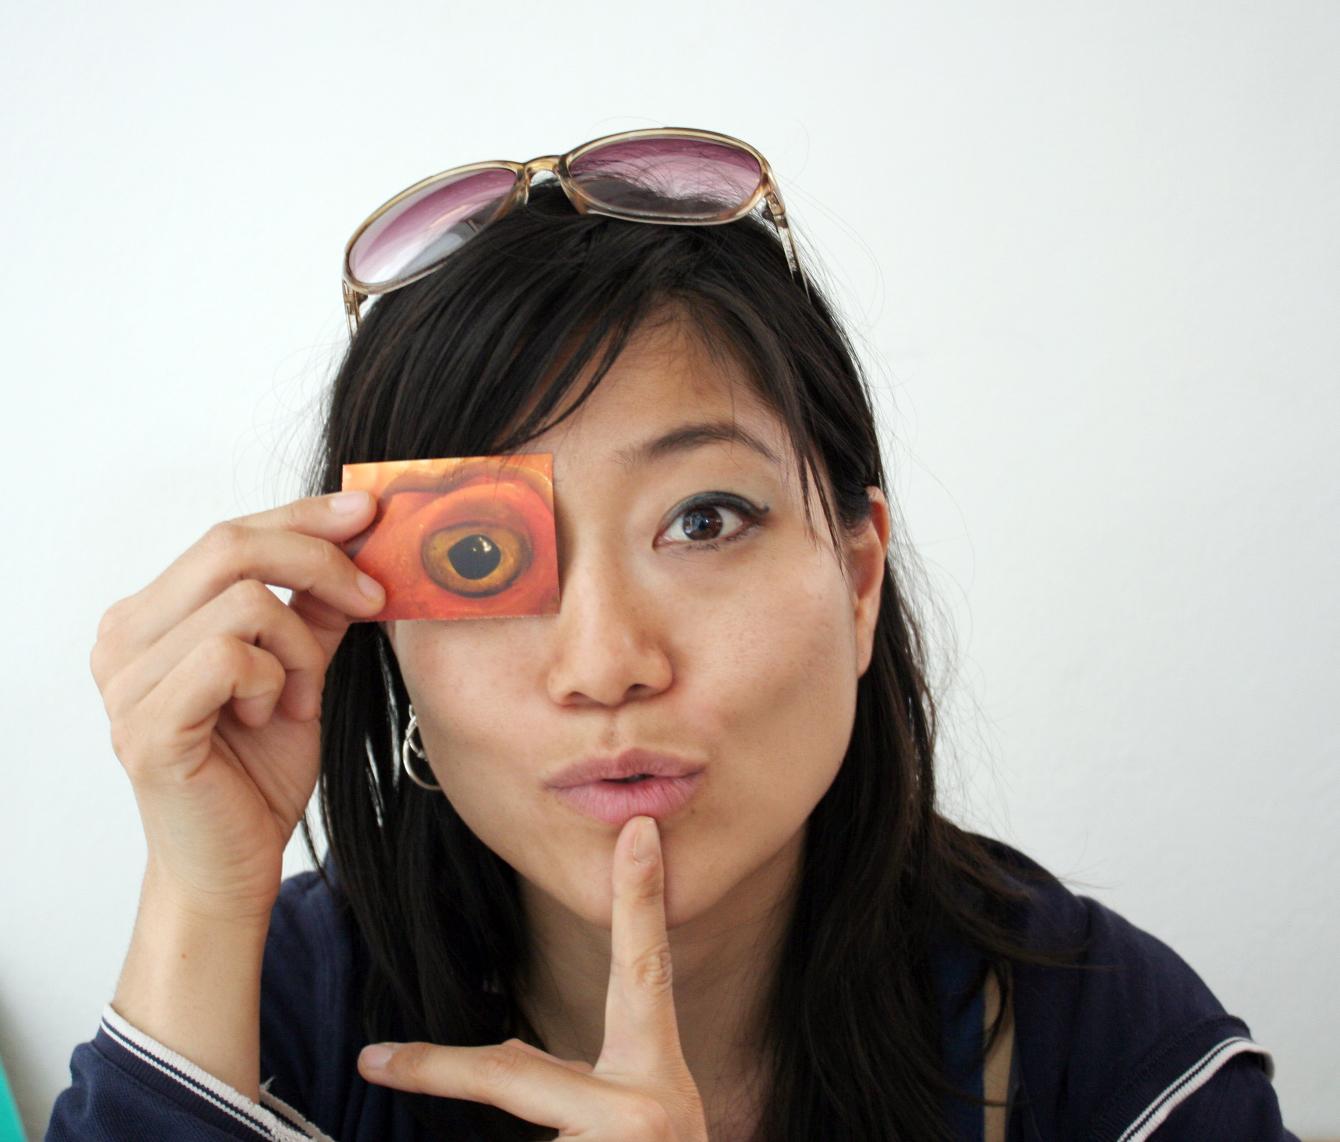 Momoko Seto